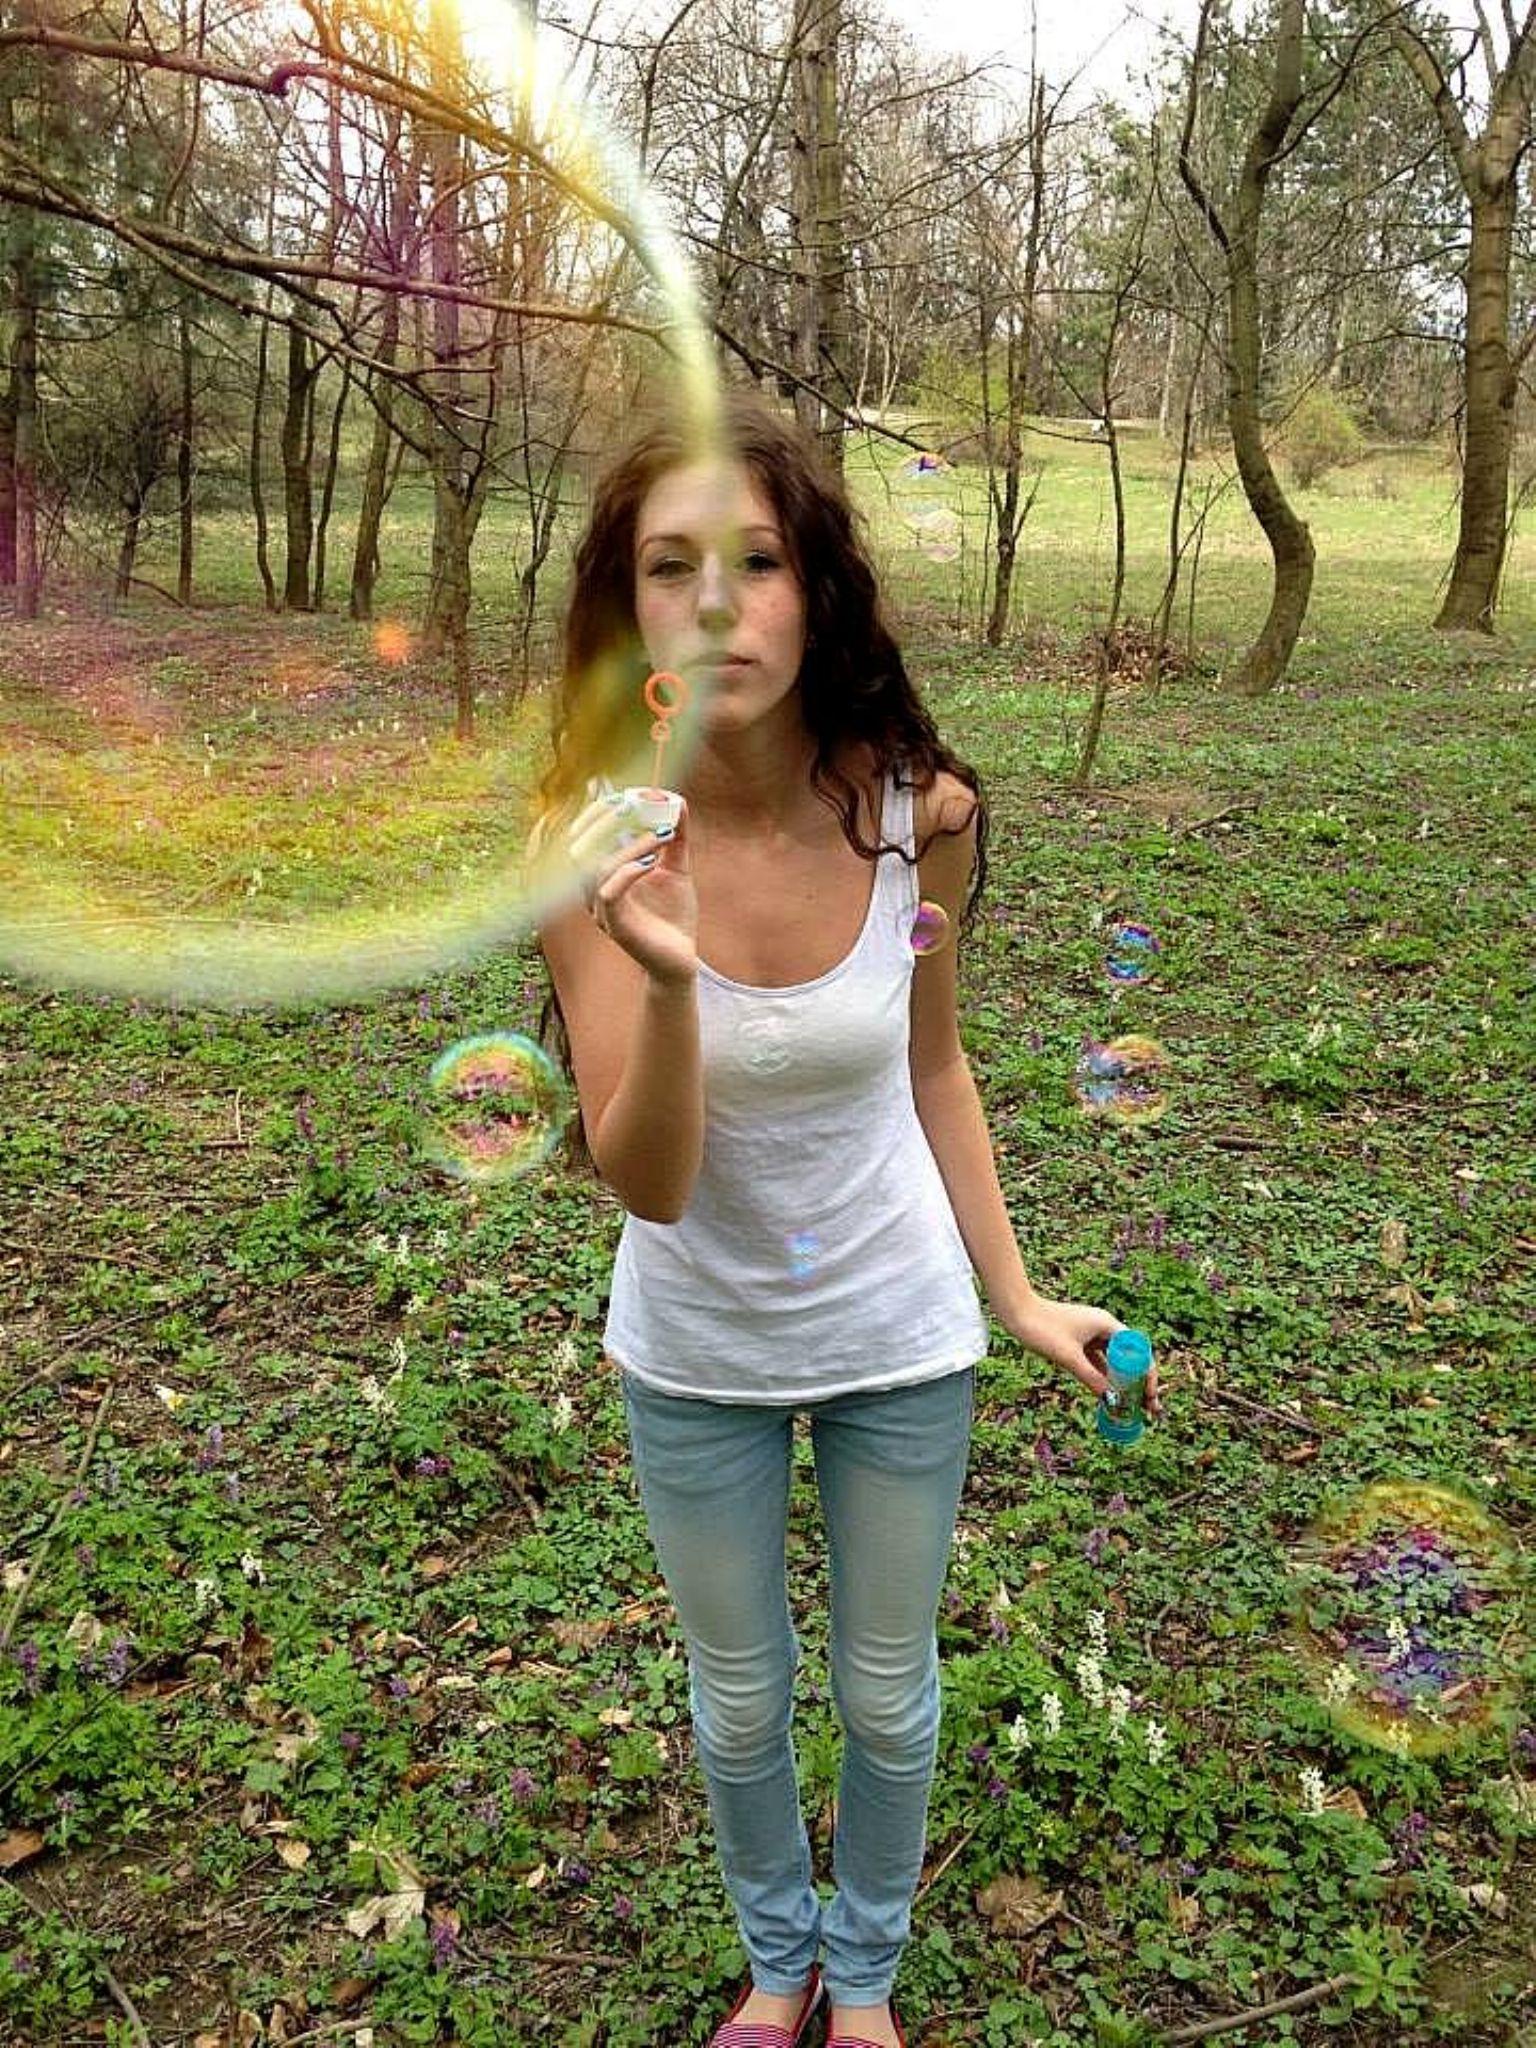 soap bubbles by Georginaphotography